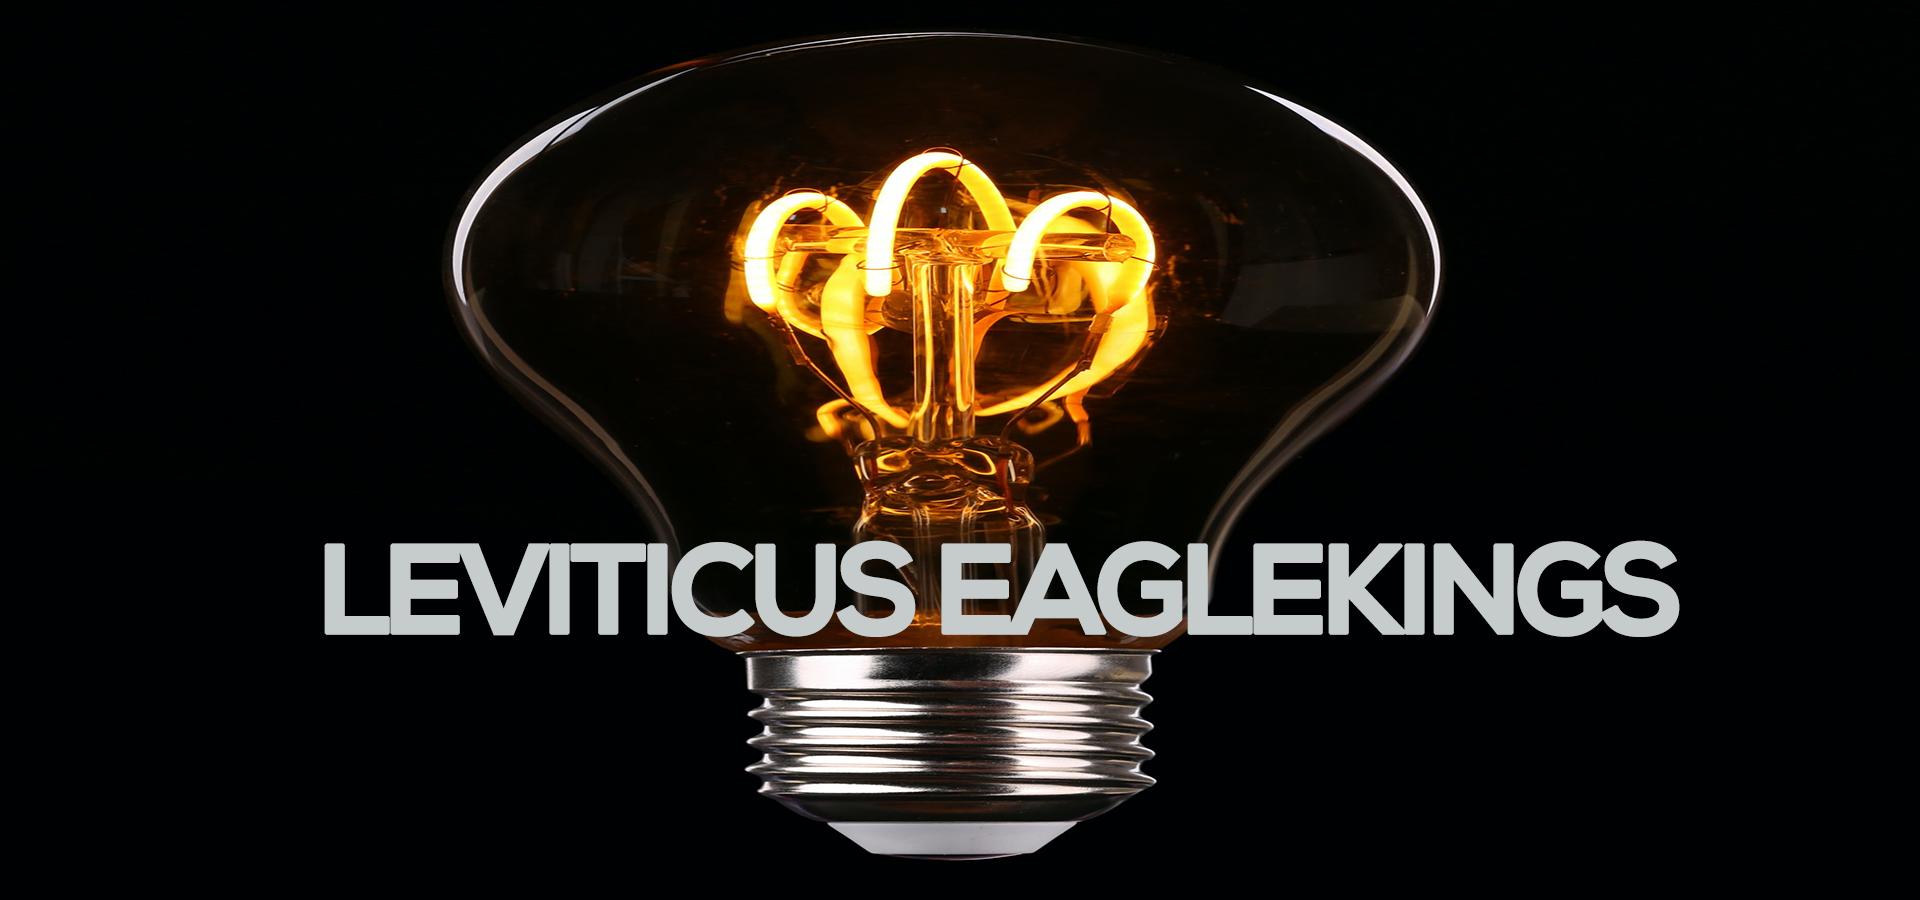 leviticus eaglekings